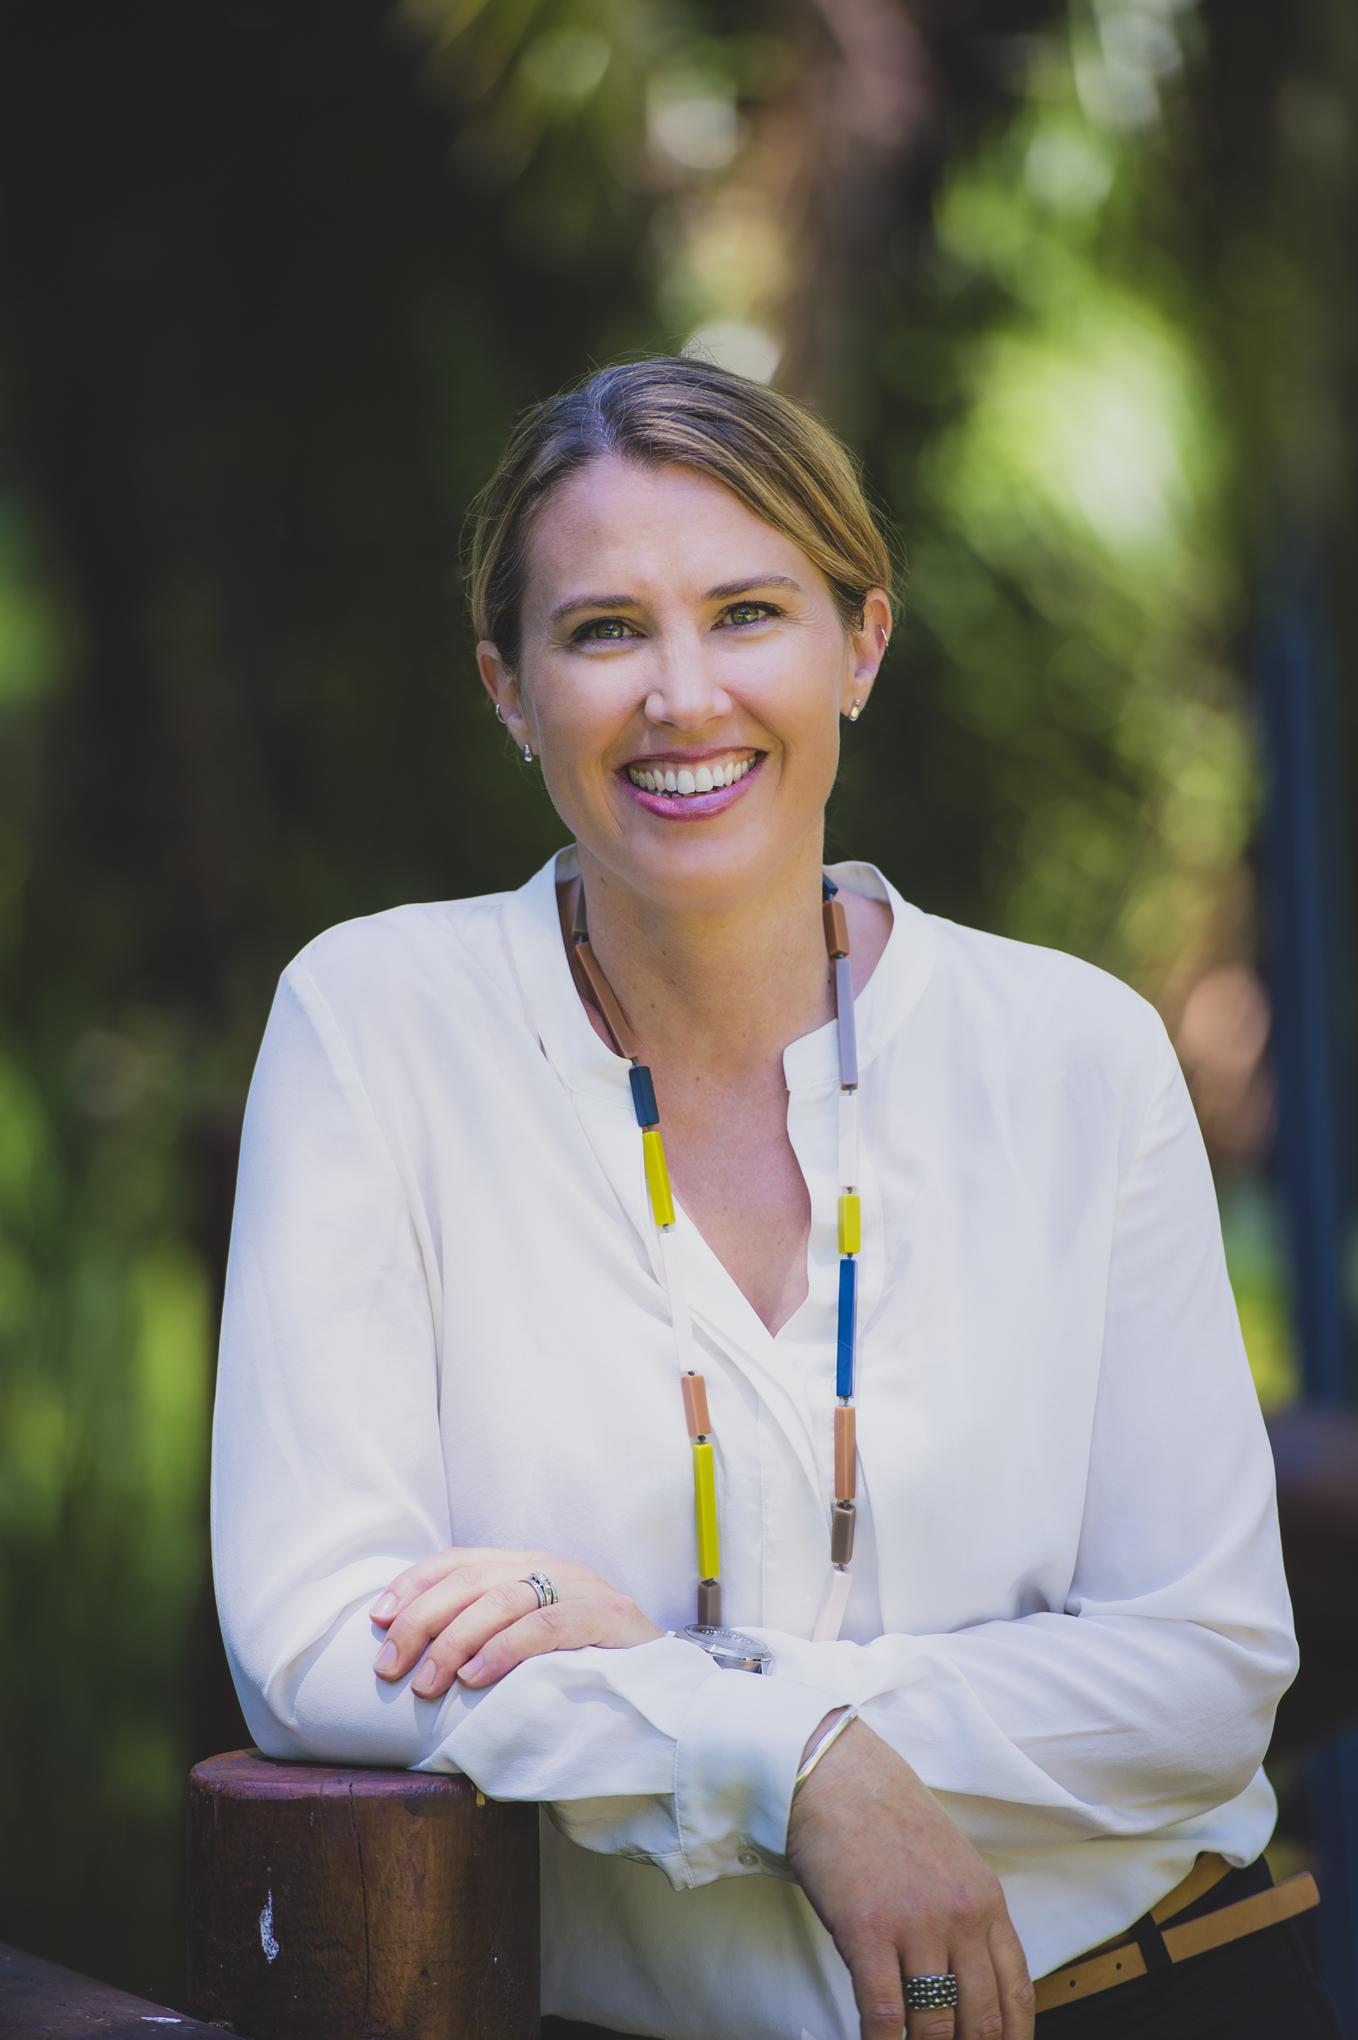 Psychologist Nicole Woodhouse